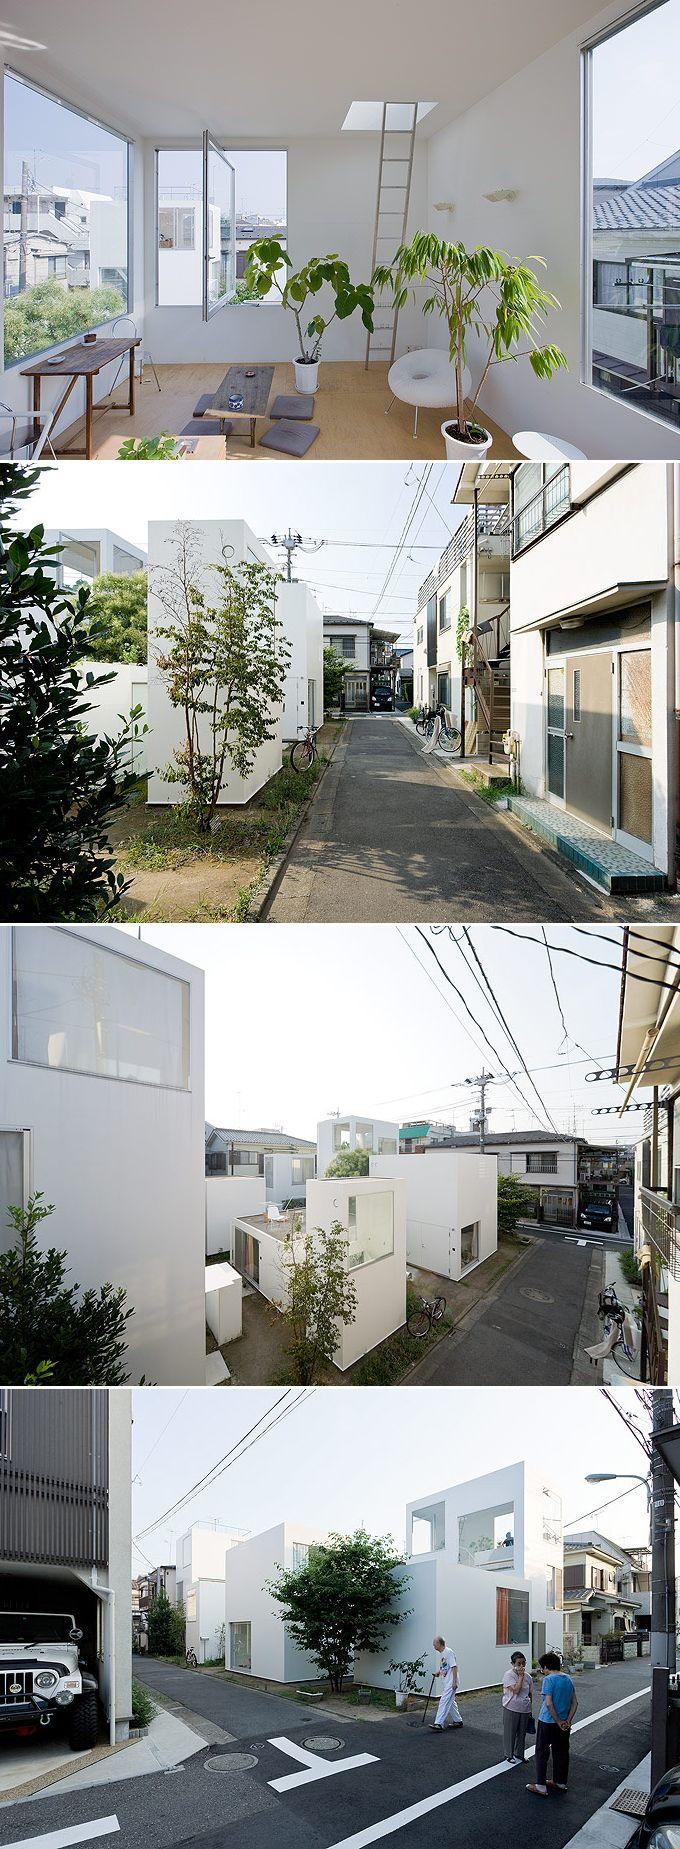 Moriyama Houses - Tokyo, by SANAA Studios / photo Iwan Baan